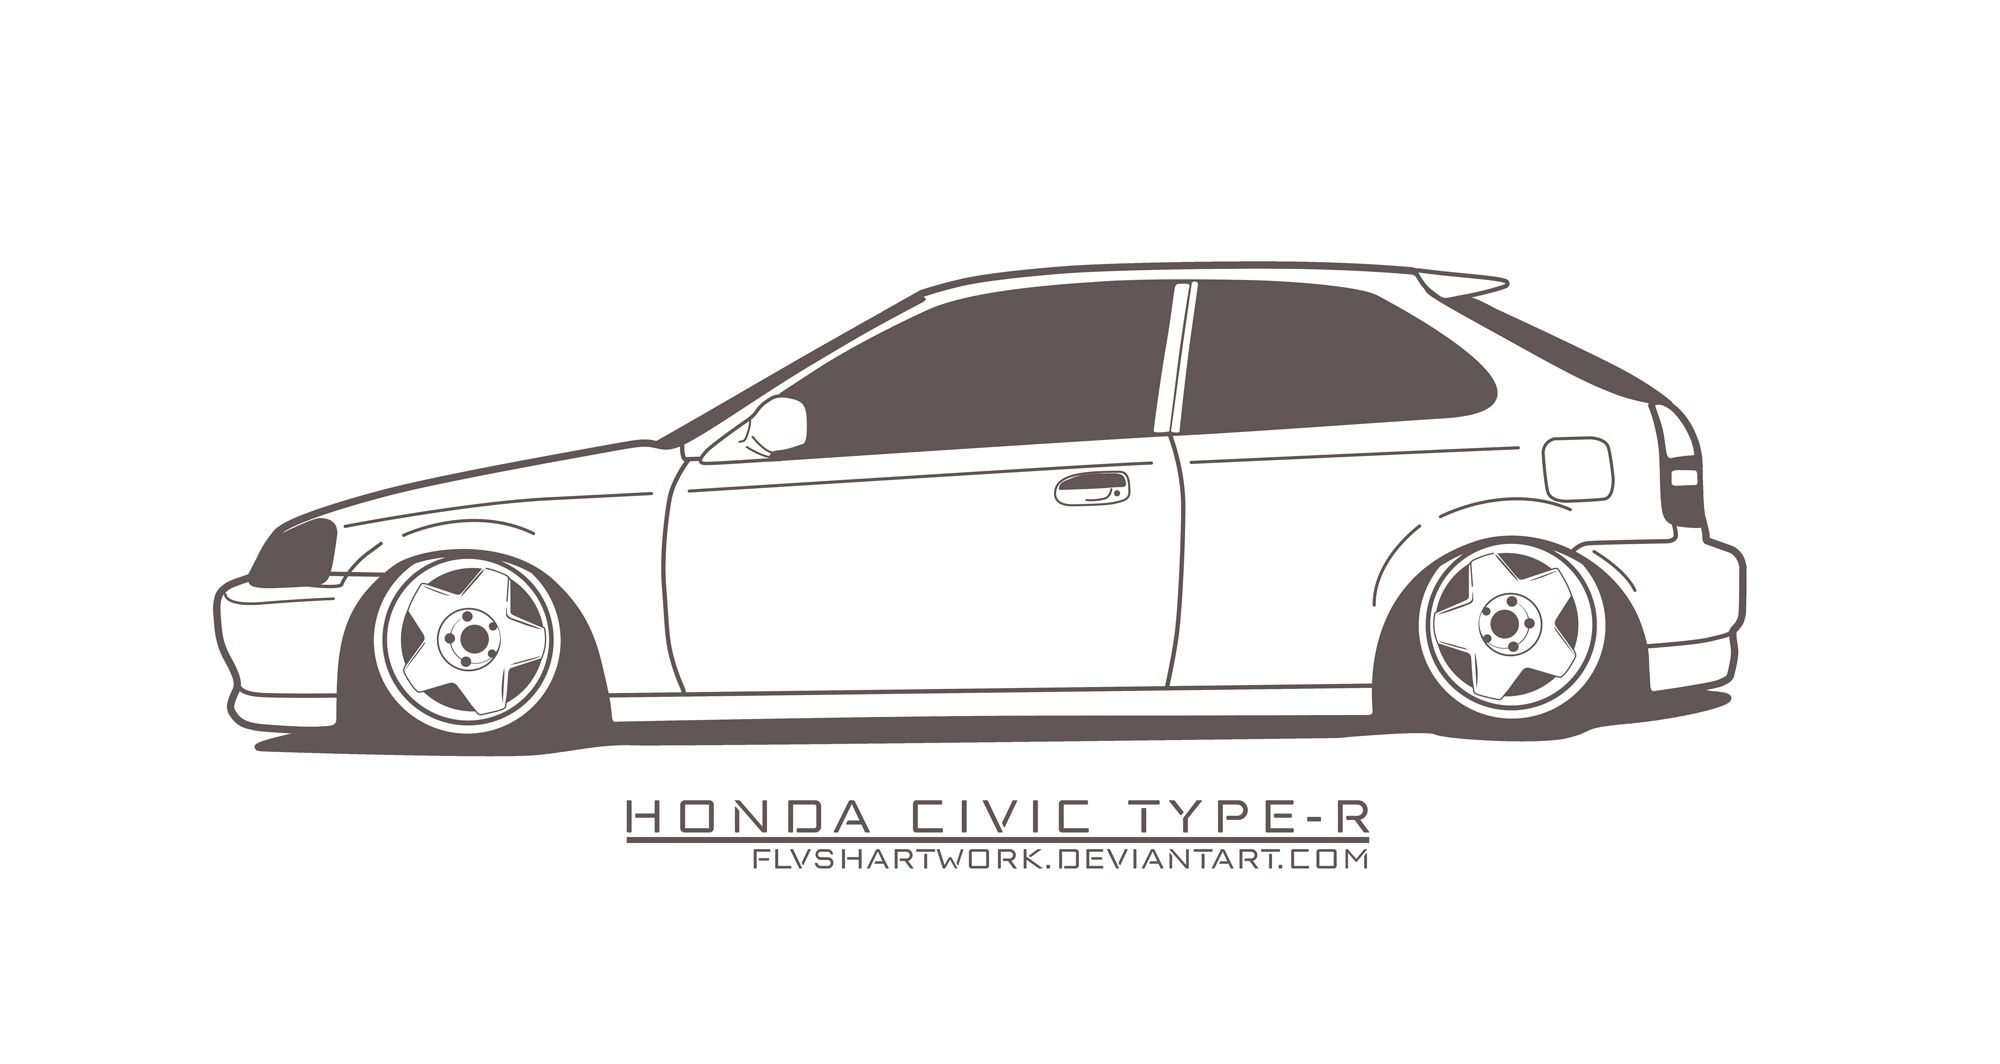 Civic Type R Jdm Car Art Coloring Pages